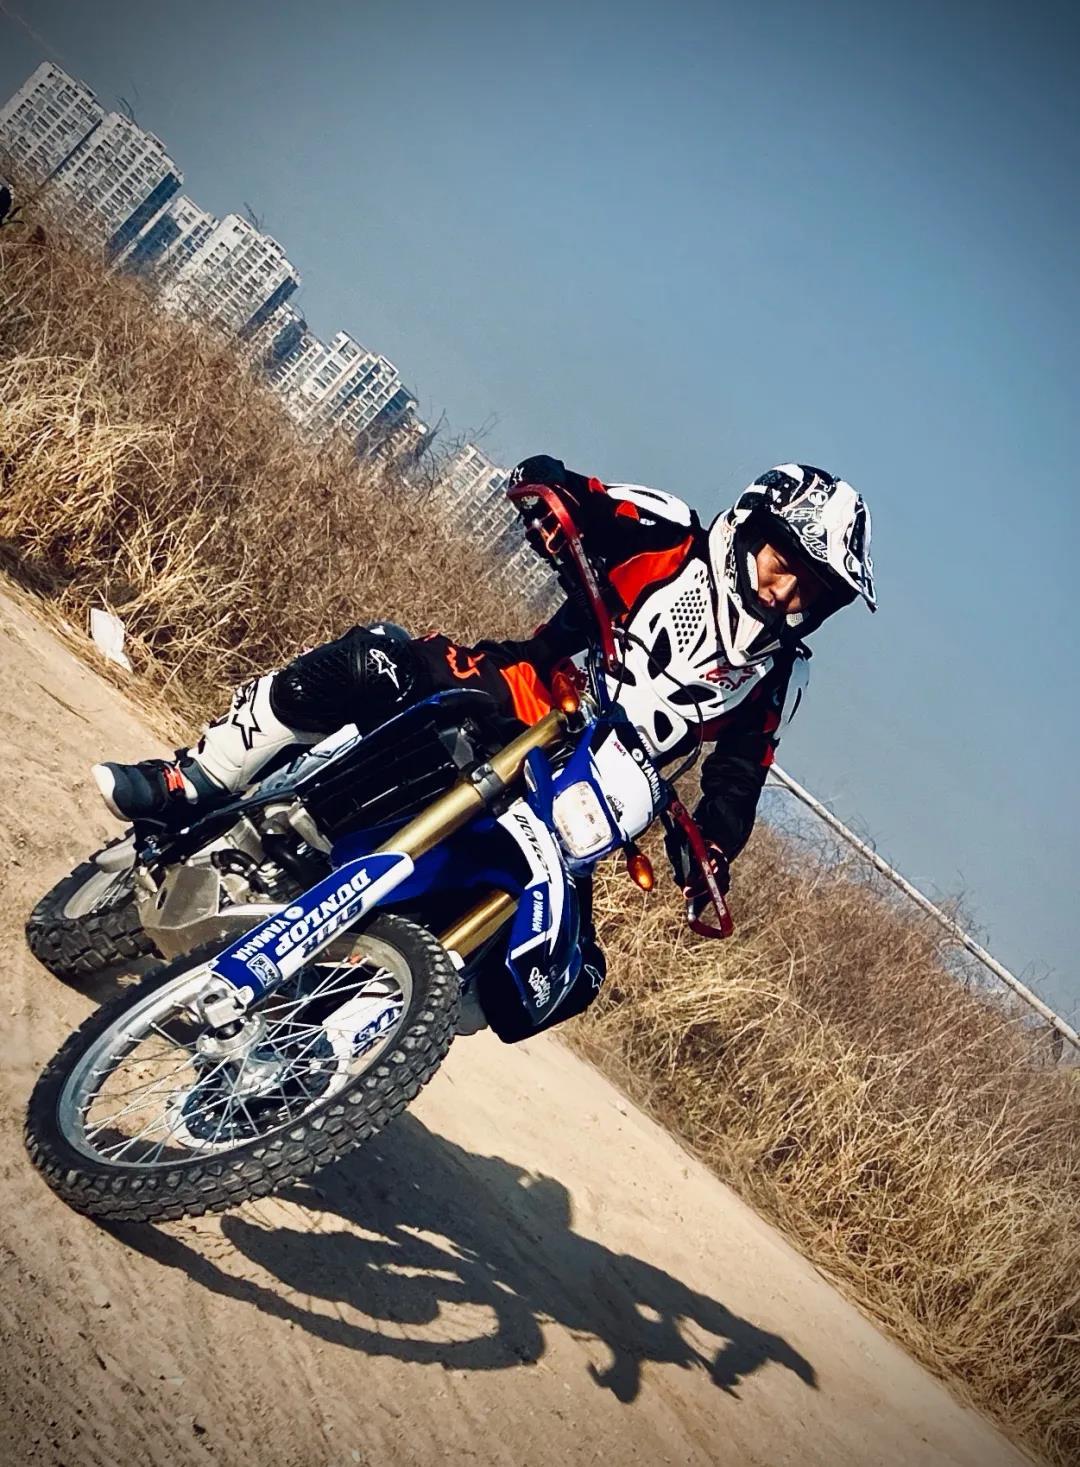 Fufeng Brother's Motorcycle Trip At Last Weekend of 2020-18.jpg